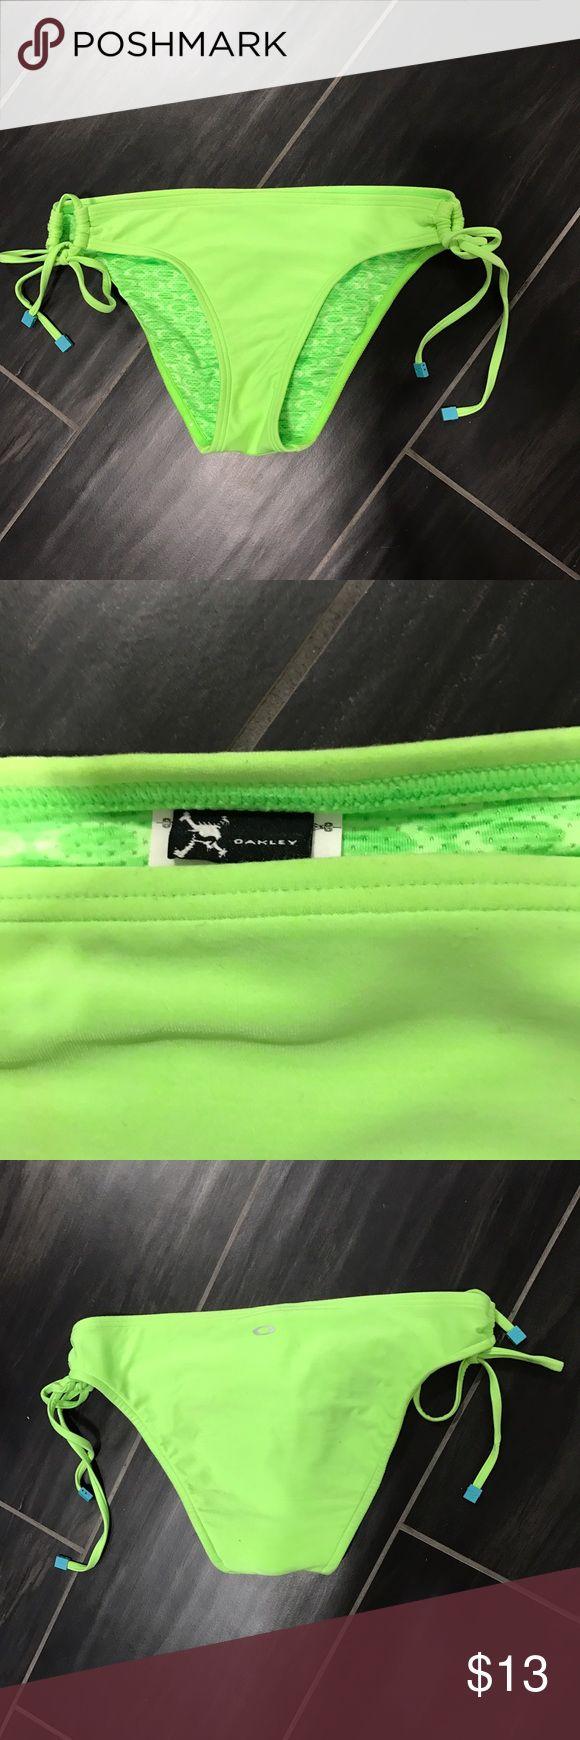 Cute Neon Green Bikini Bottoms! Neon bikini bottoms. Never worn and in perfect condition. Oakley brand so a good material. Make an offer ! 😊 Oakley Swim Bikinis